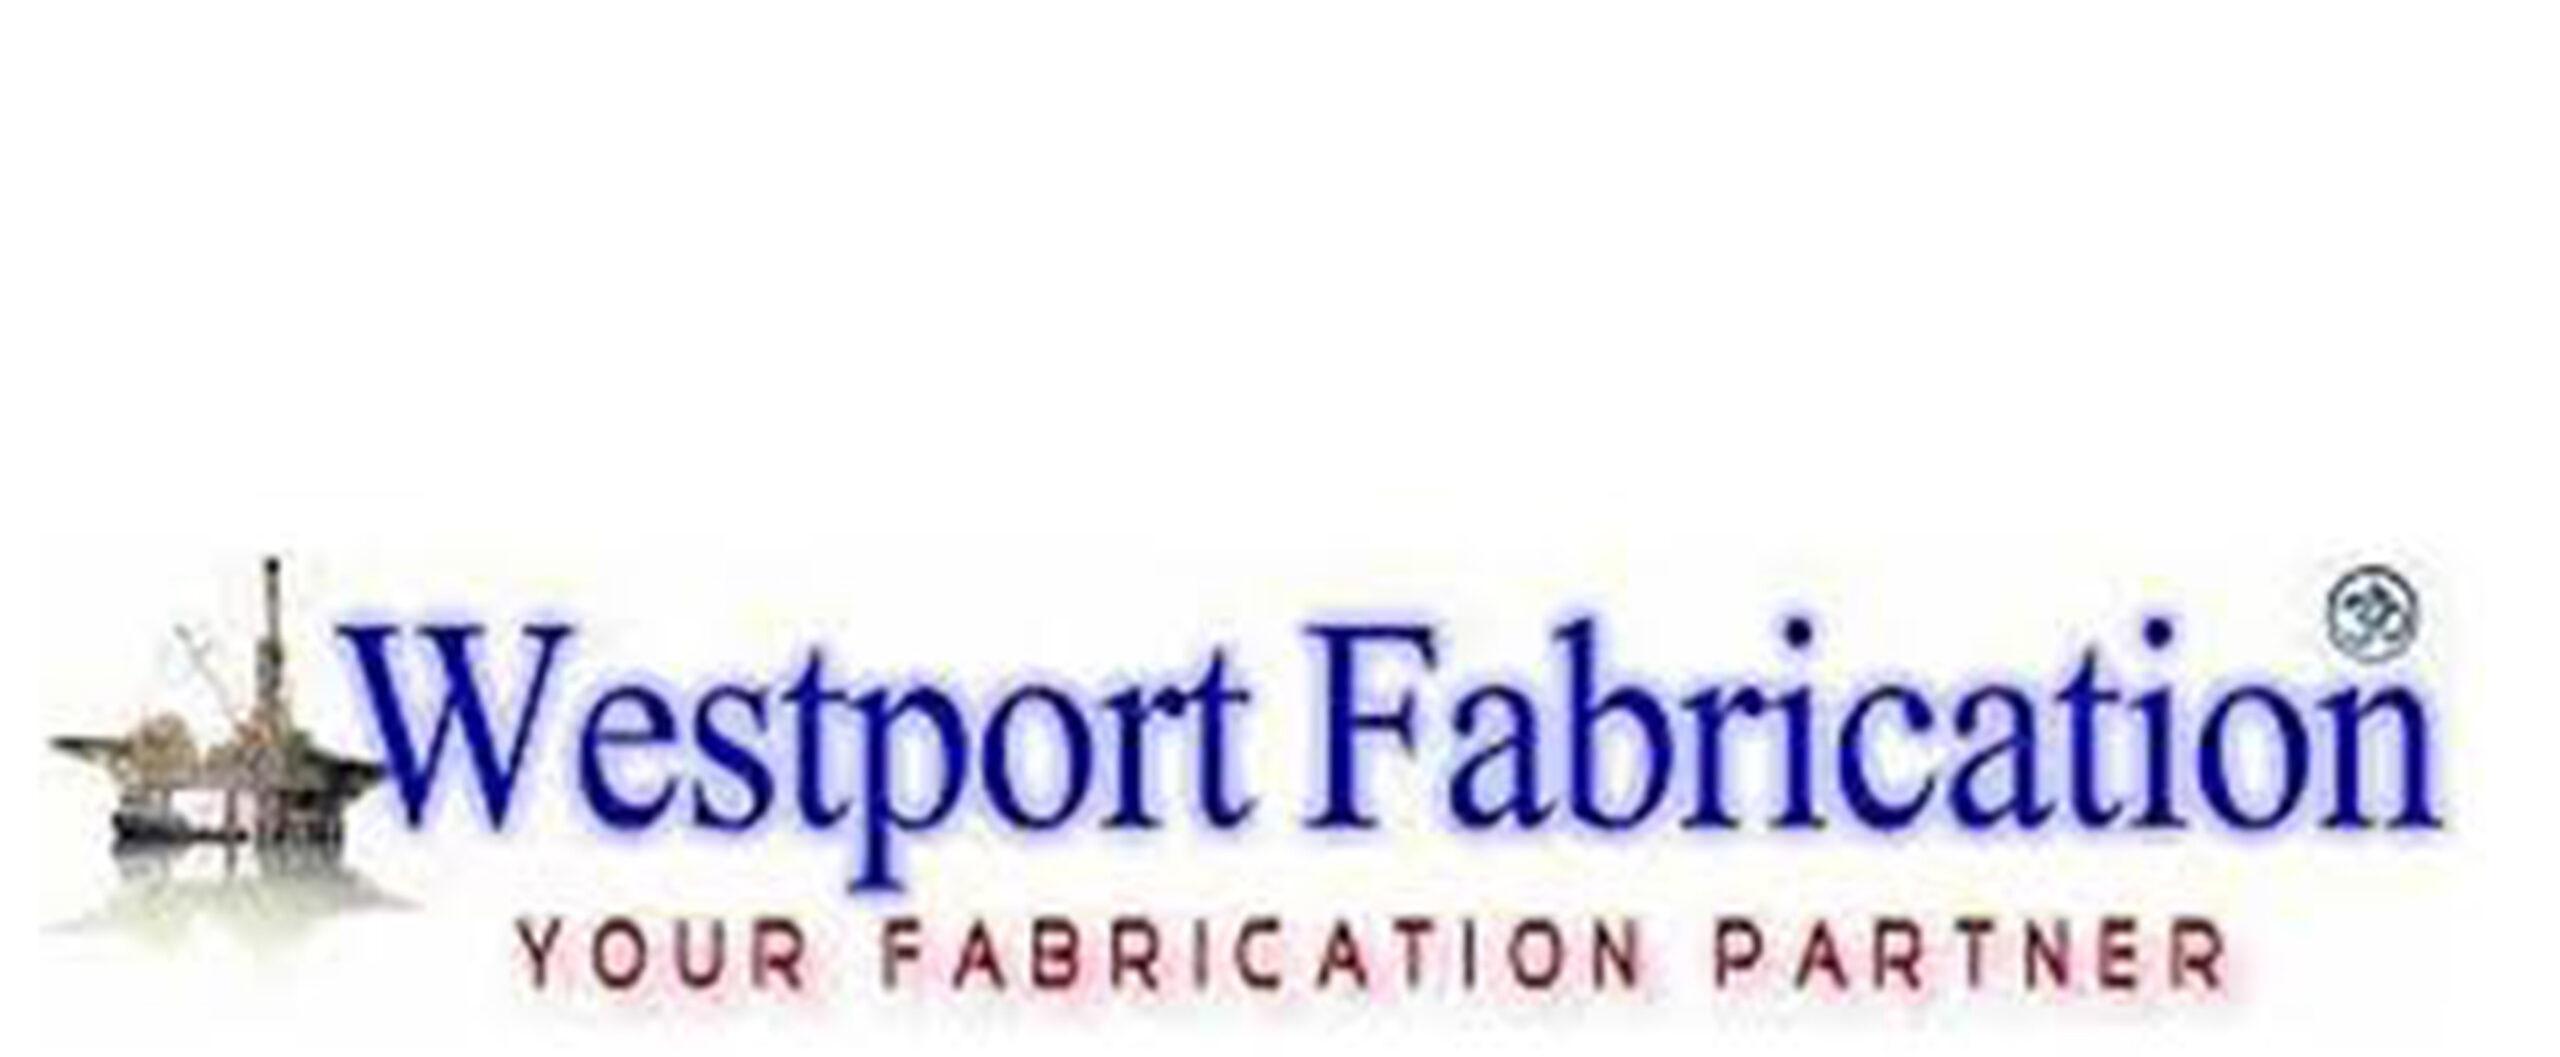 10. Westport Fabrication